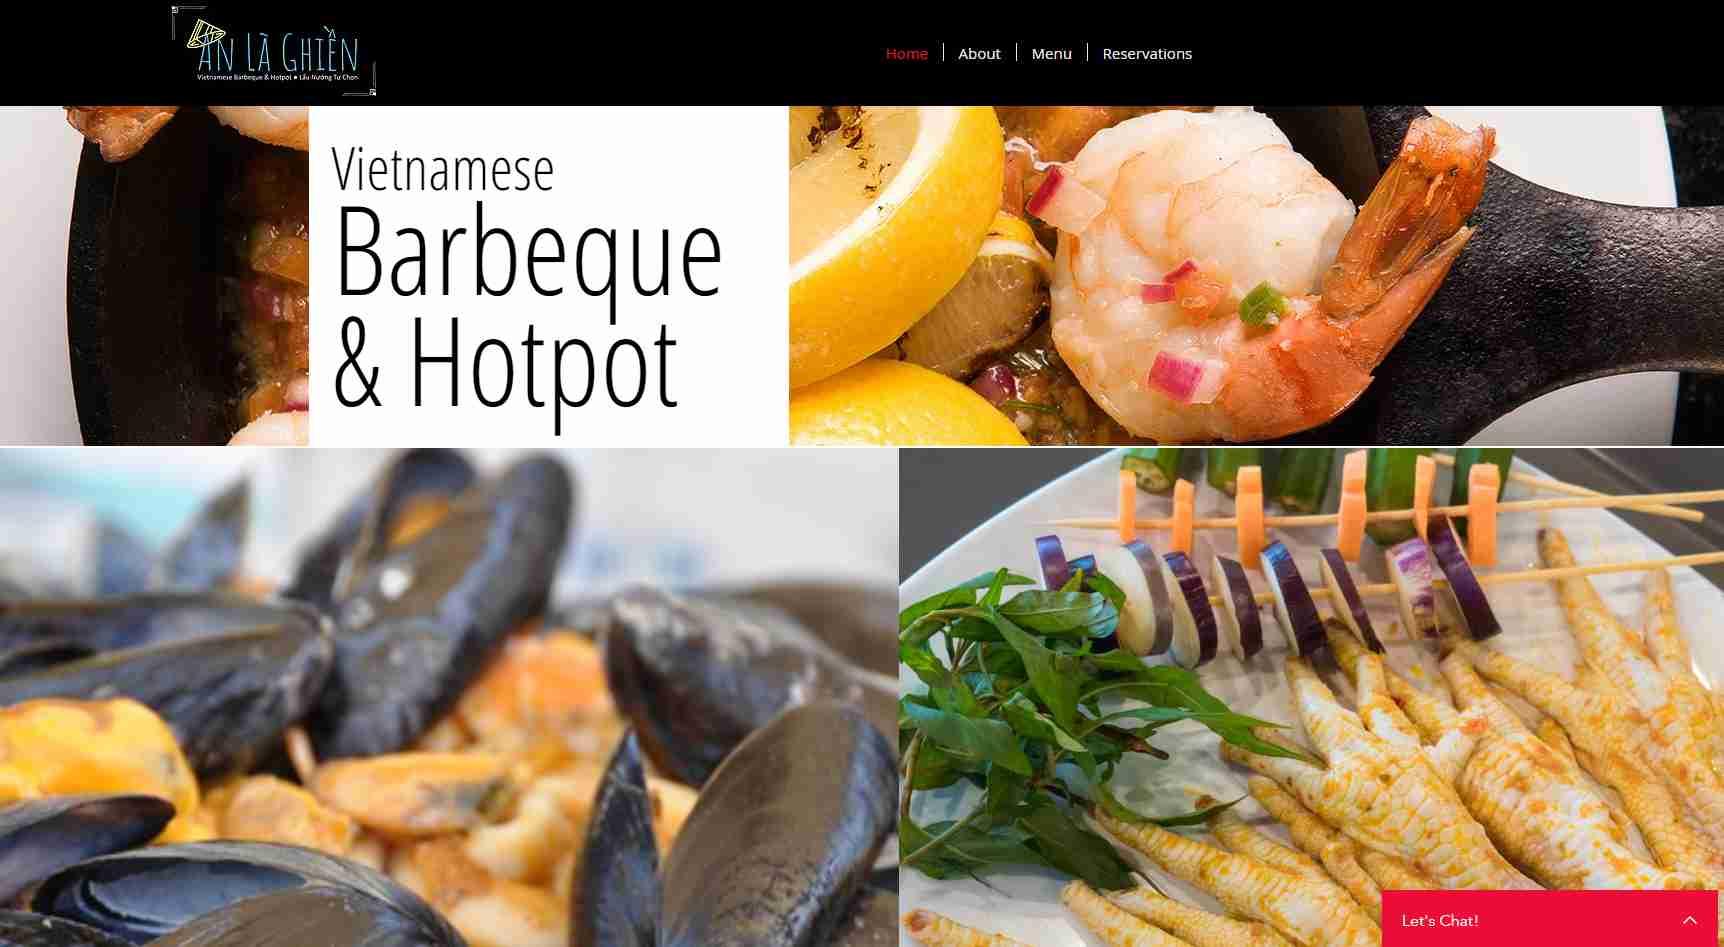 An La Ghien Top Vietnamese Food Restaurants in Singapore